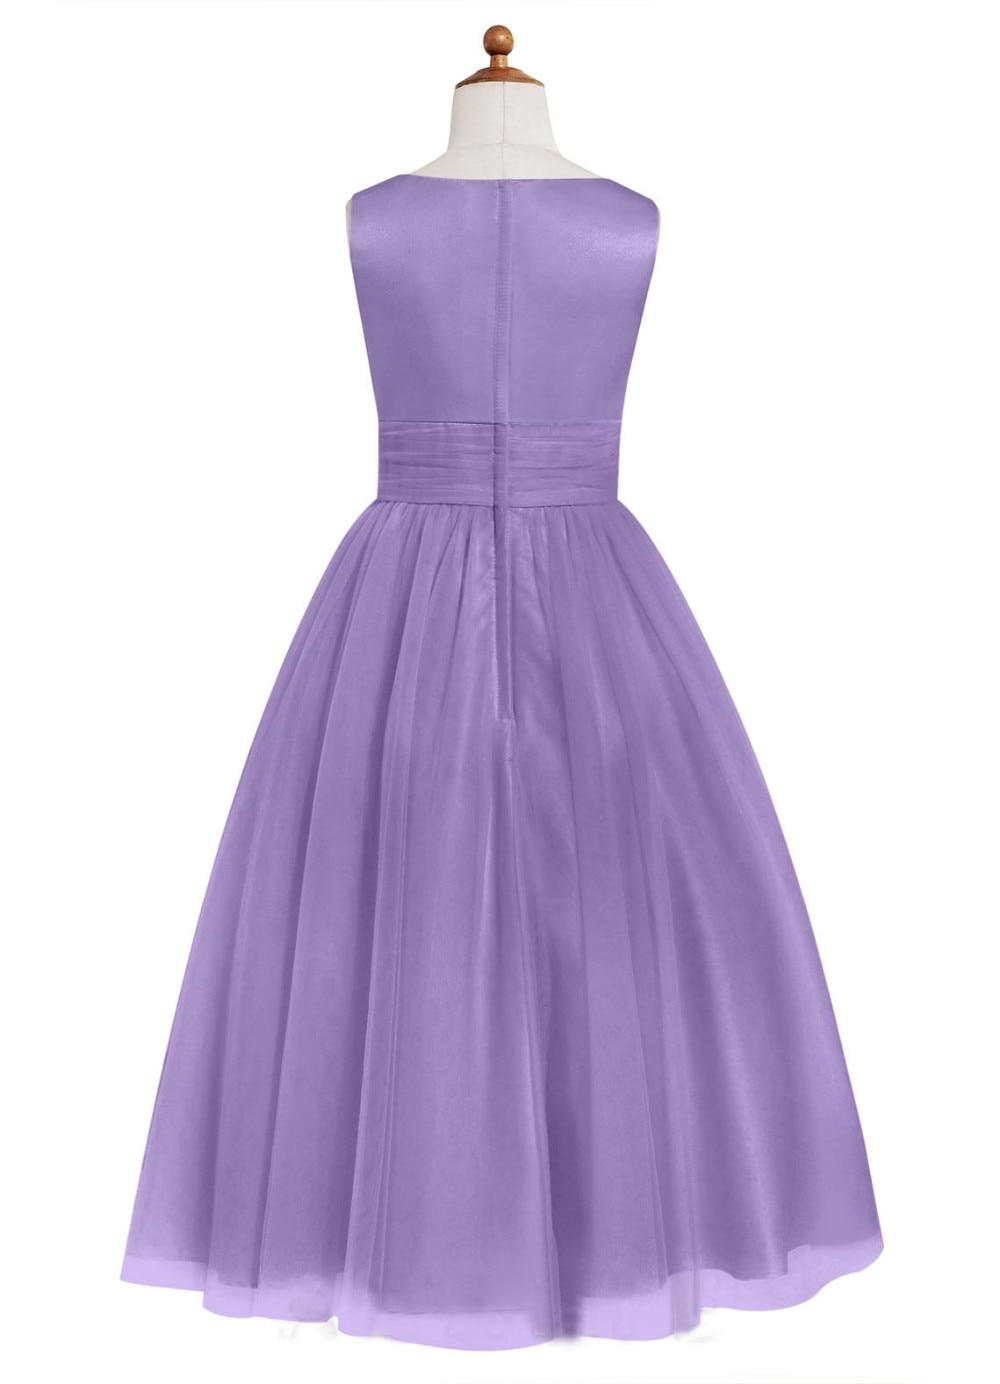 Cuadro verdadero Púrpura Flor de Té de Longitud dama de Honor Junior ...